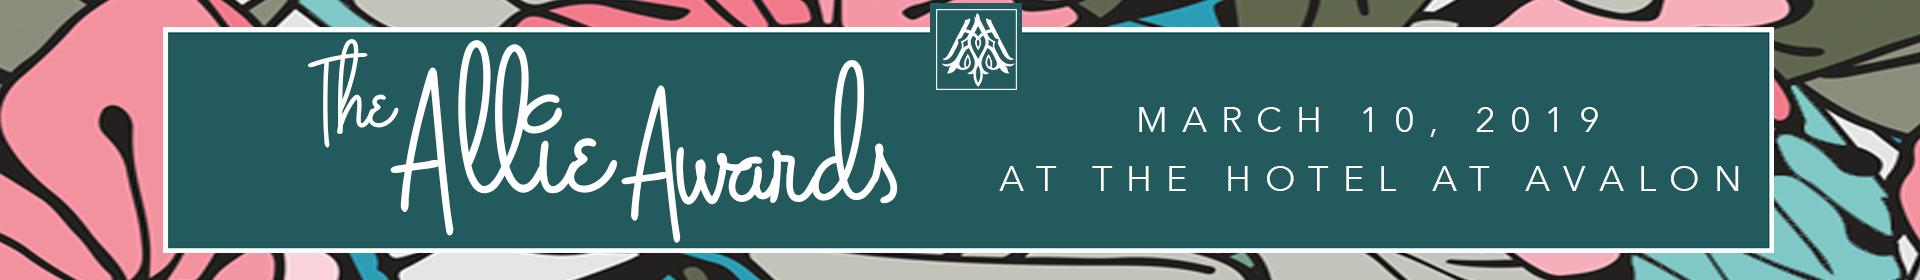 2019 Atlanta Allie Awards Event Banner